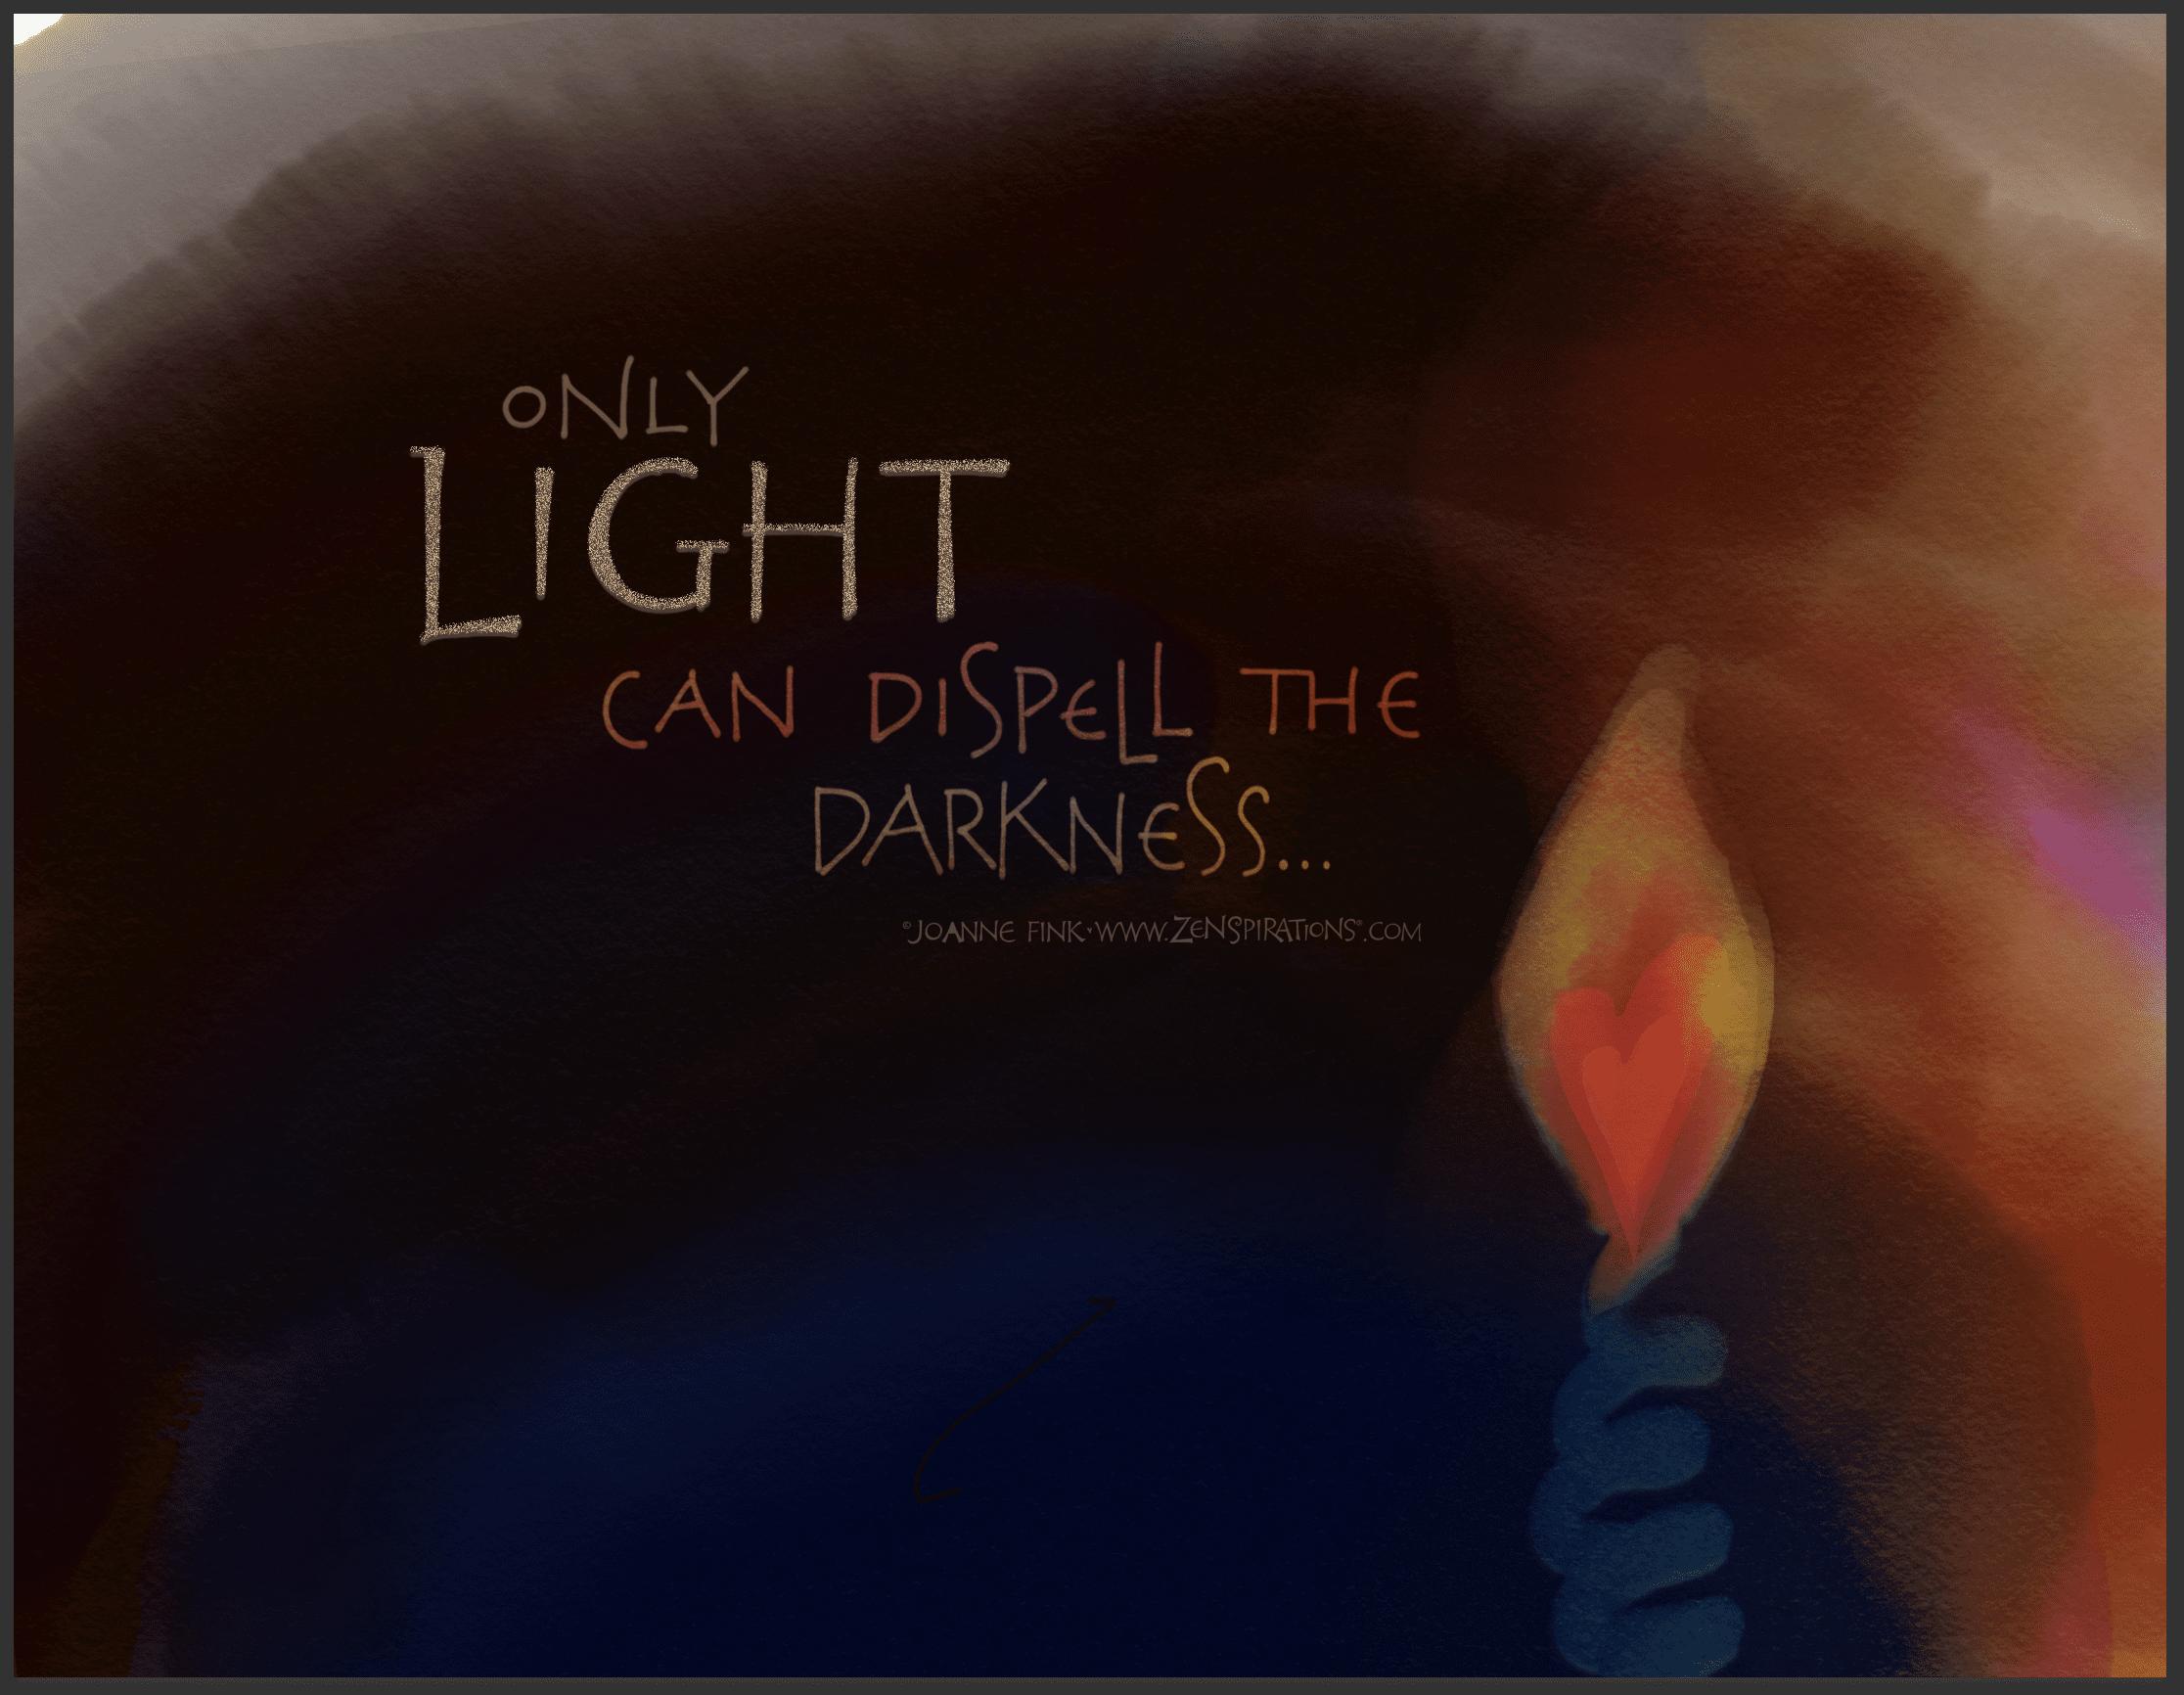 Zenspirations®_by_Joanne_Fink_Blog_1_30_17_Only_Light